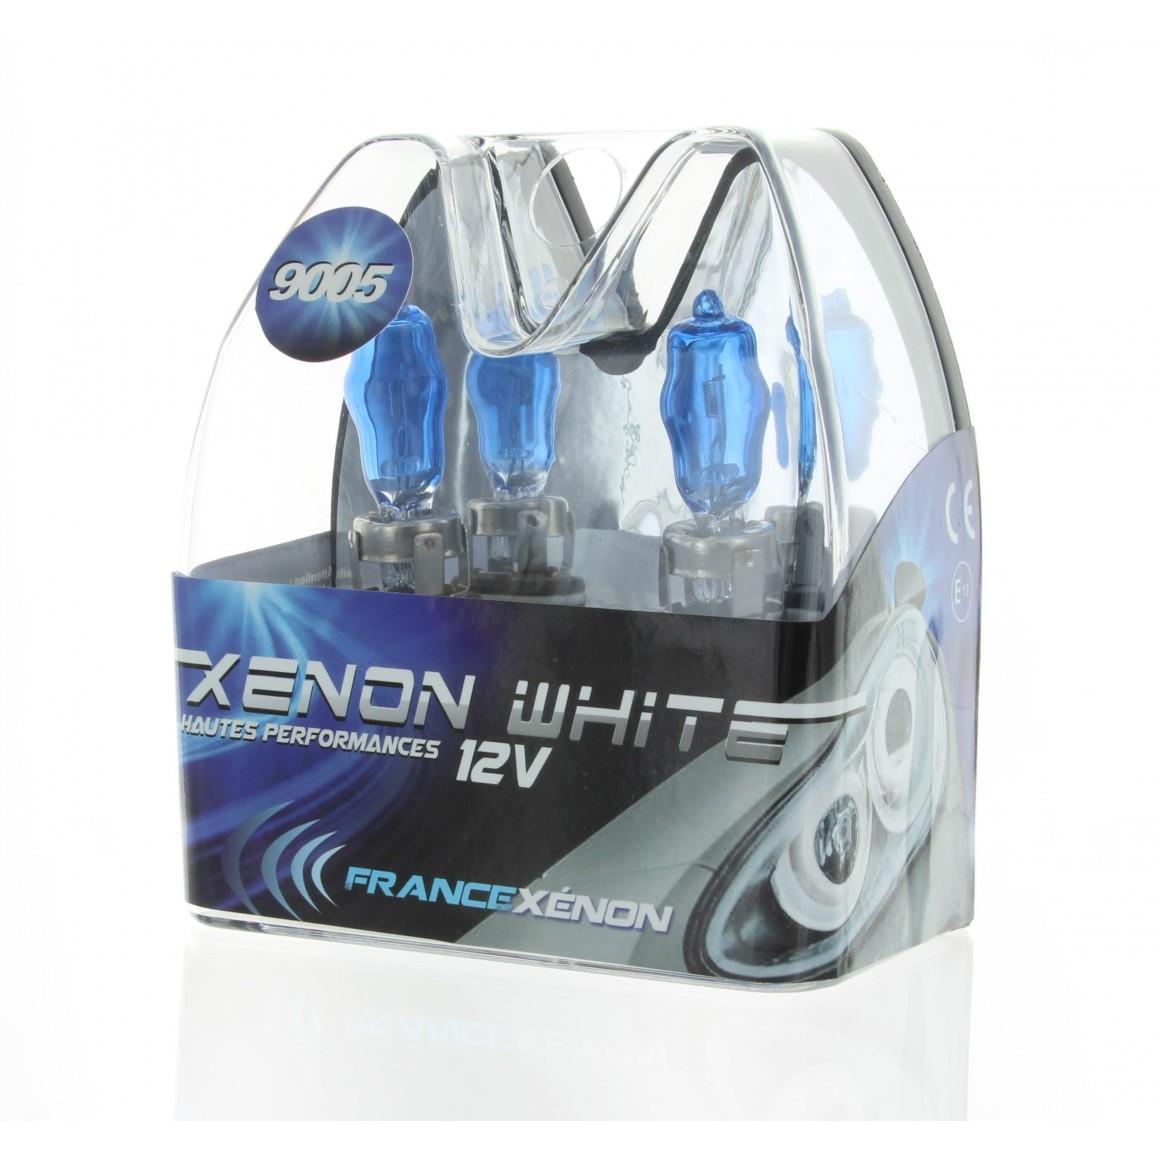 2 x HB3 9005 65W 6000K HOD Xtrem - FRANCE-XENON